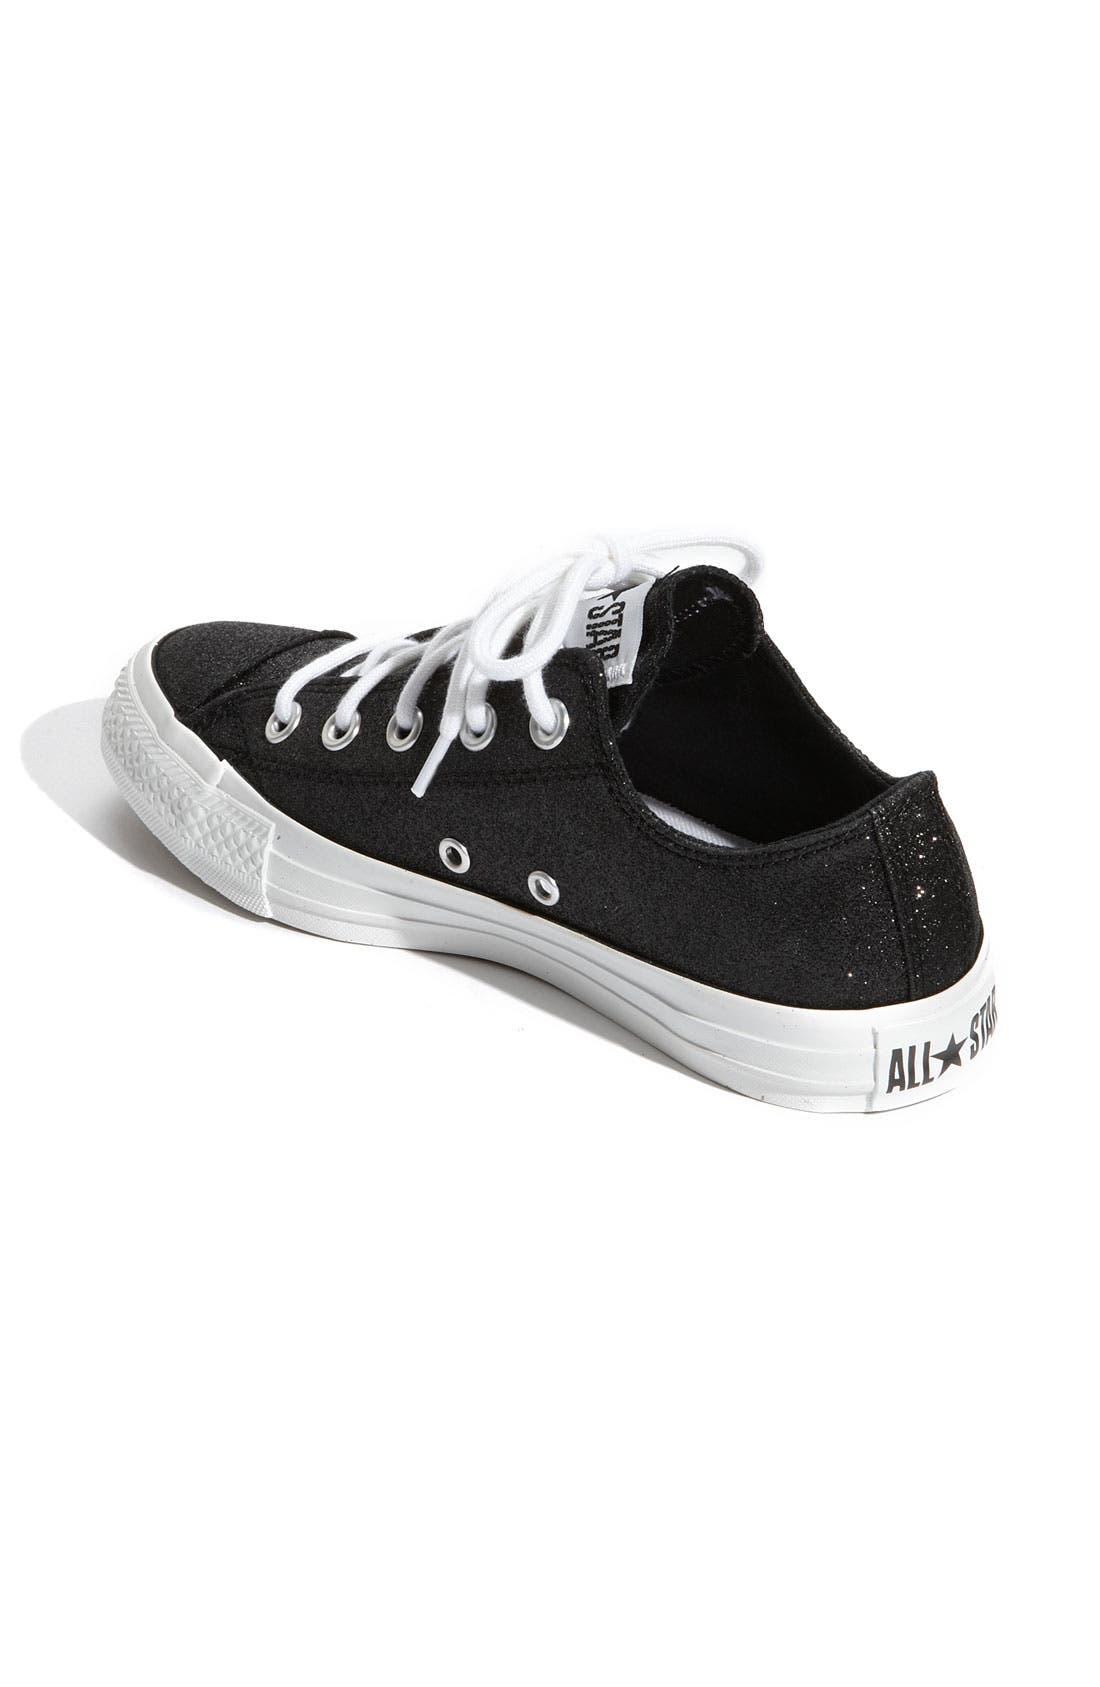 Chuck Taylor<sup>®</sup> 'Winter Glitz' Sneaker,                             Alternate thumbnail 2, color,                             001